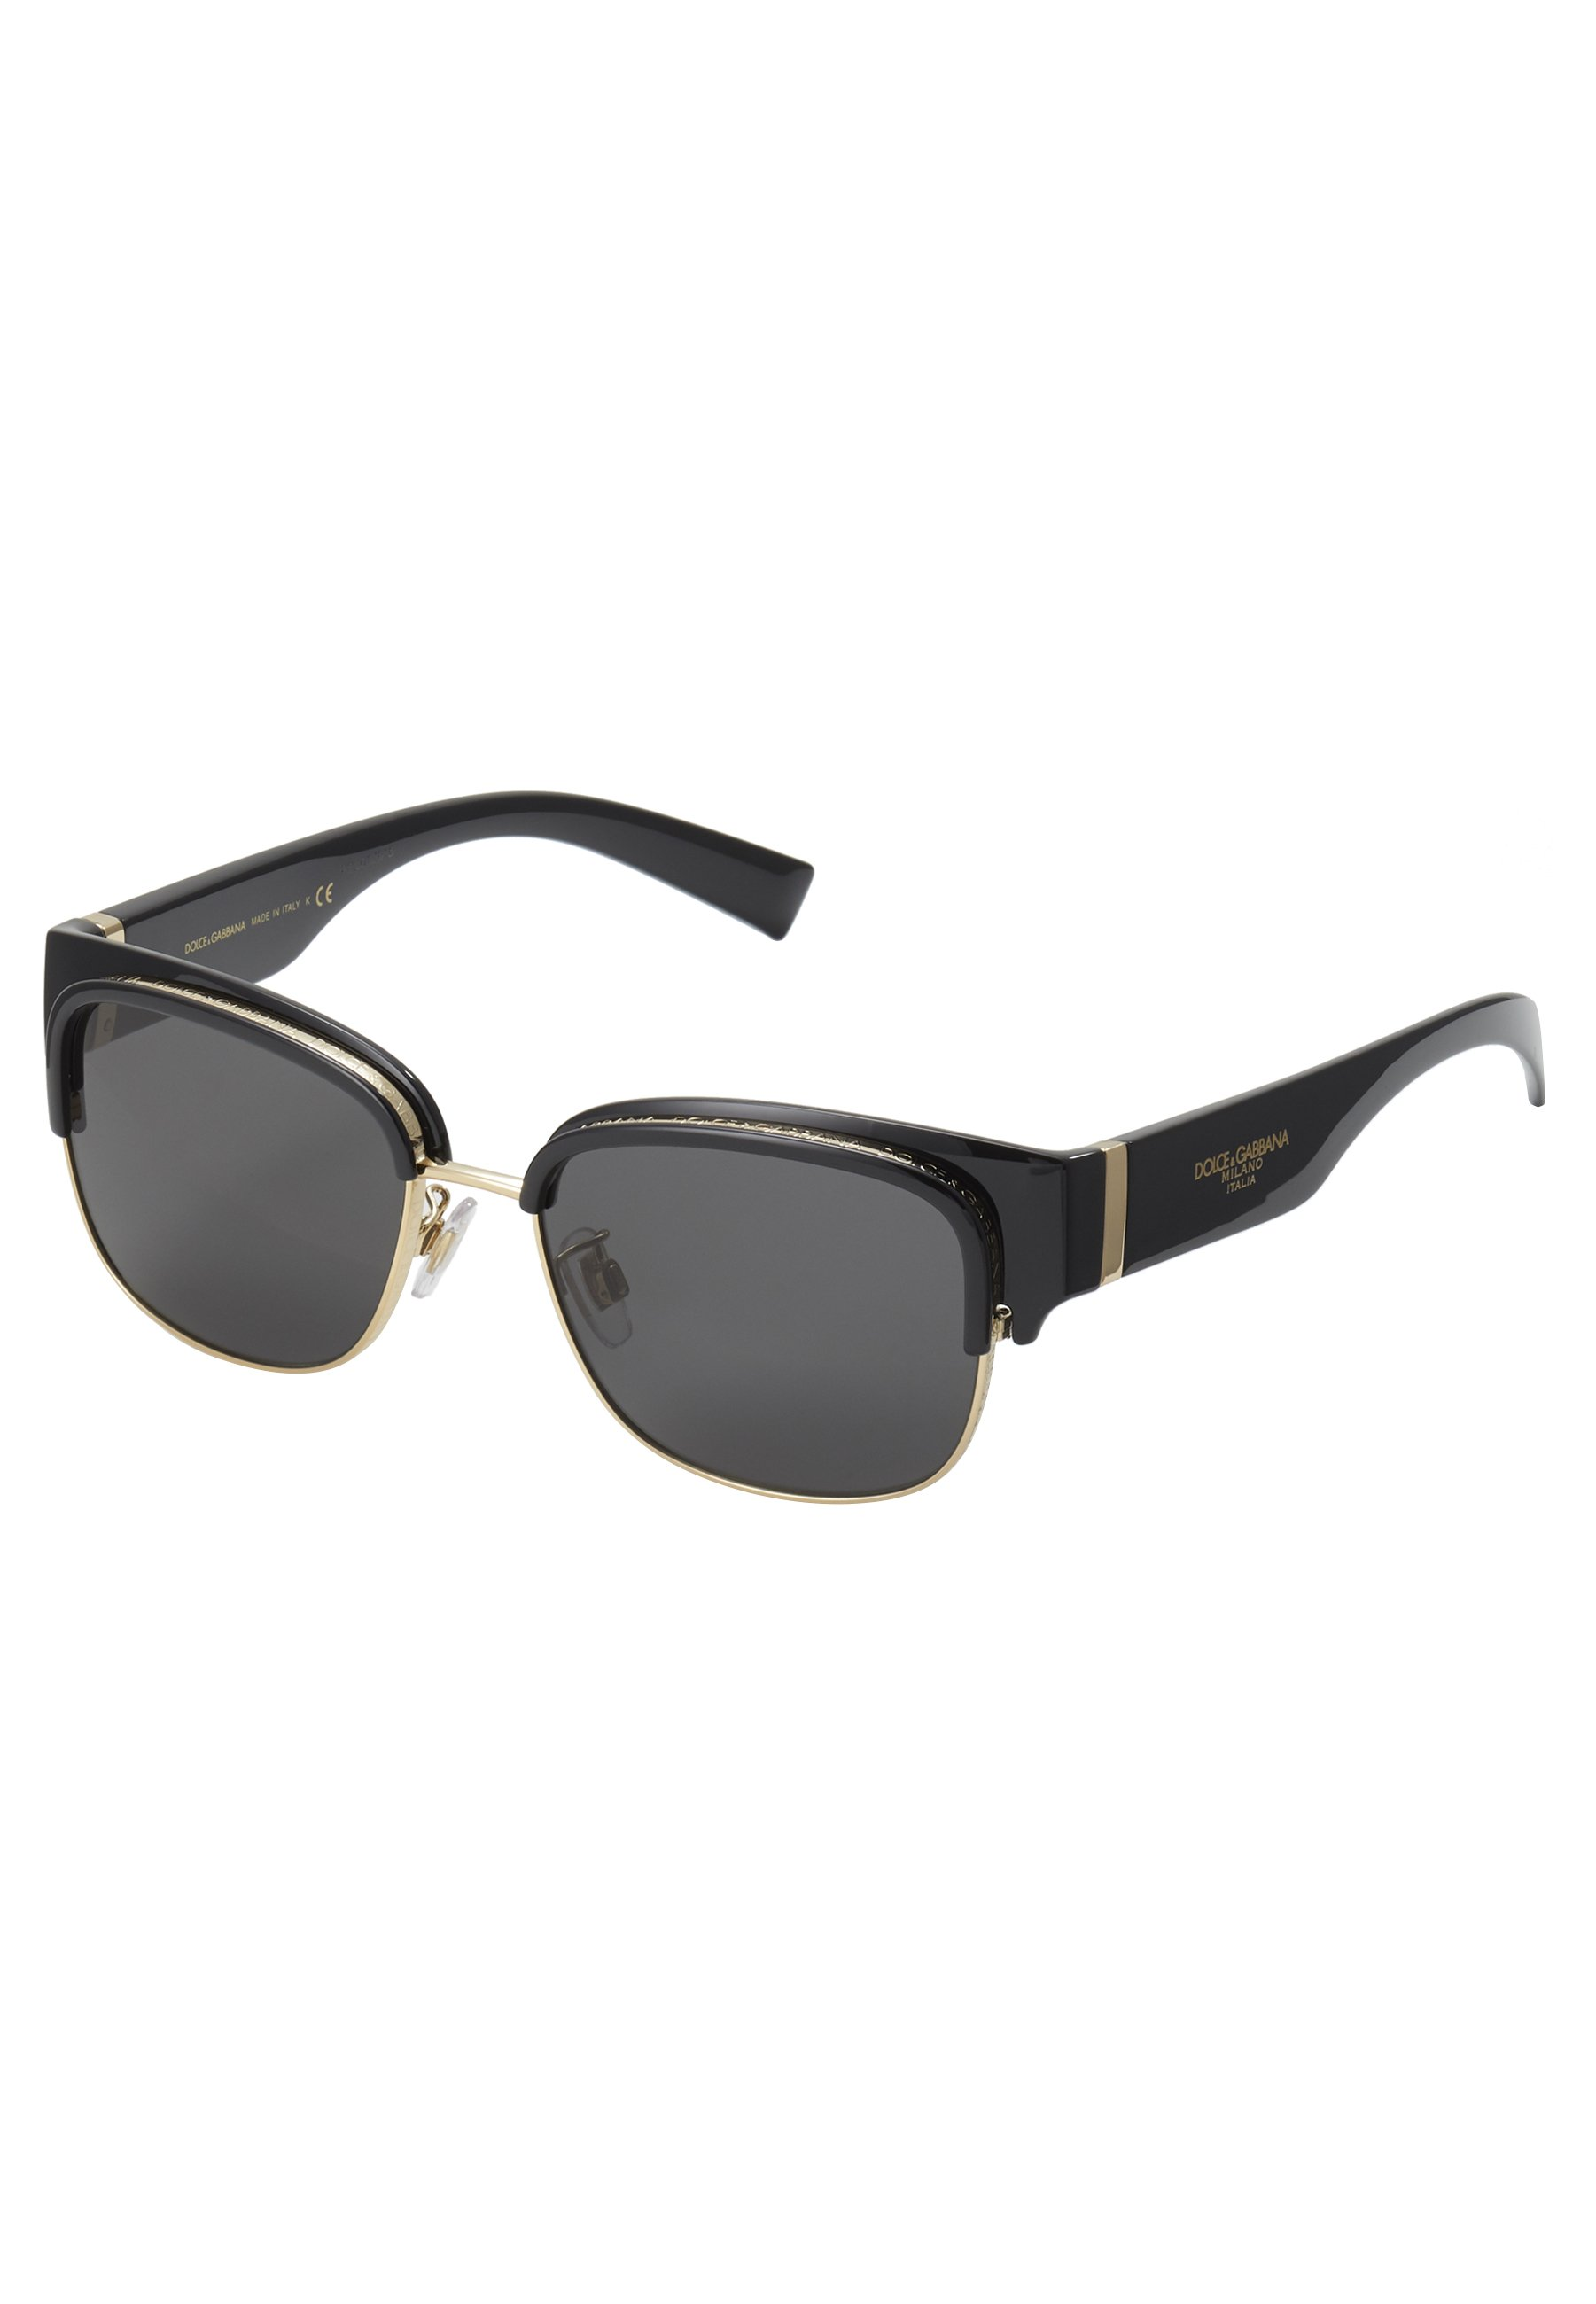 Dolce&Gabbana Solbriller - black/svart cxHAagLLQRPGTJD